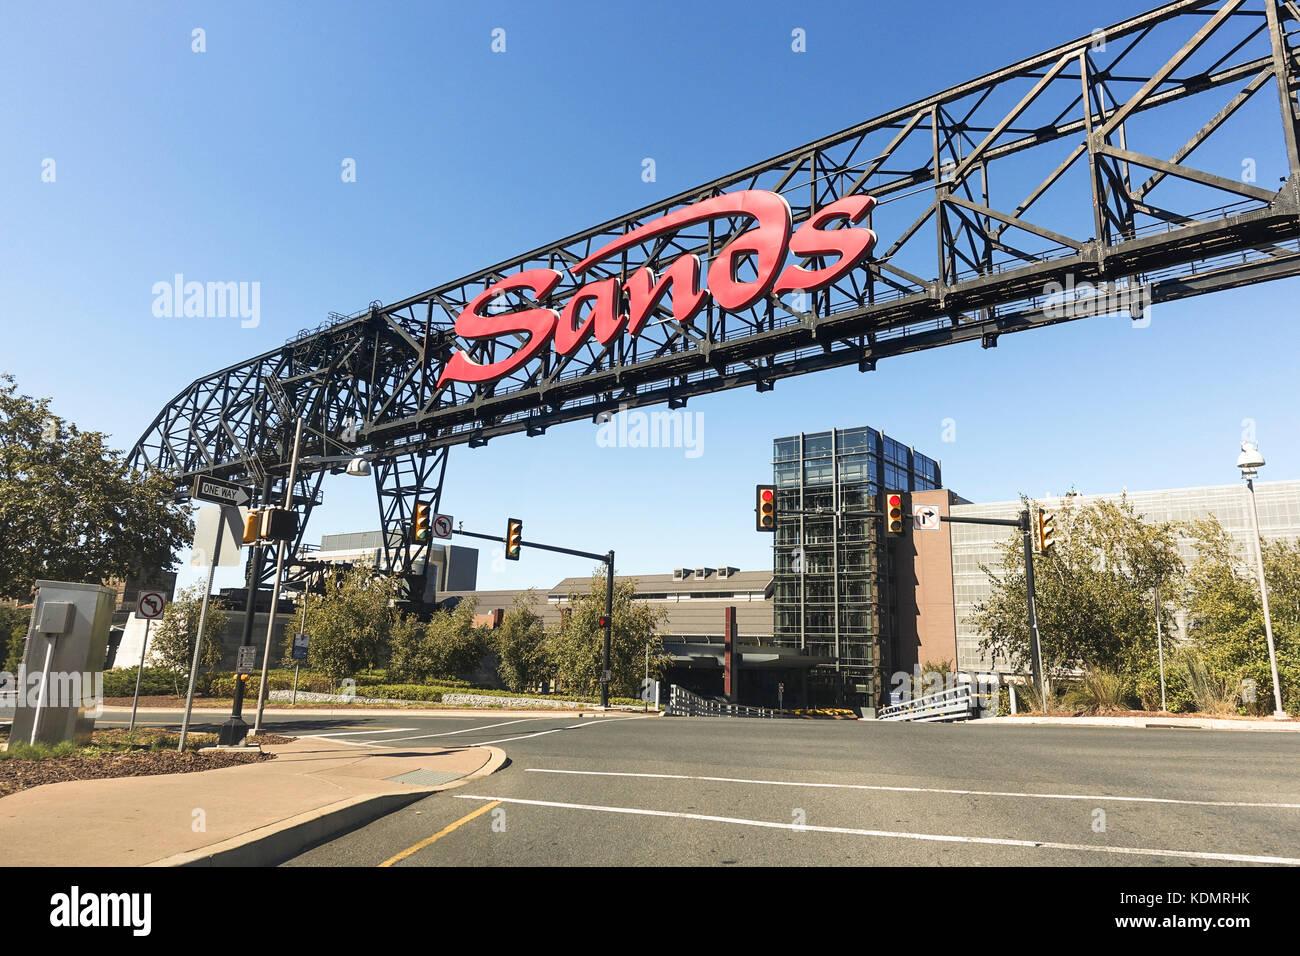 Steel Signage Stock Photos & Steel Signage Stock Images - Alamy